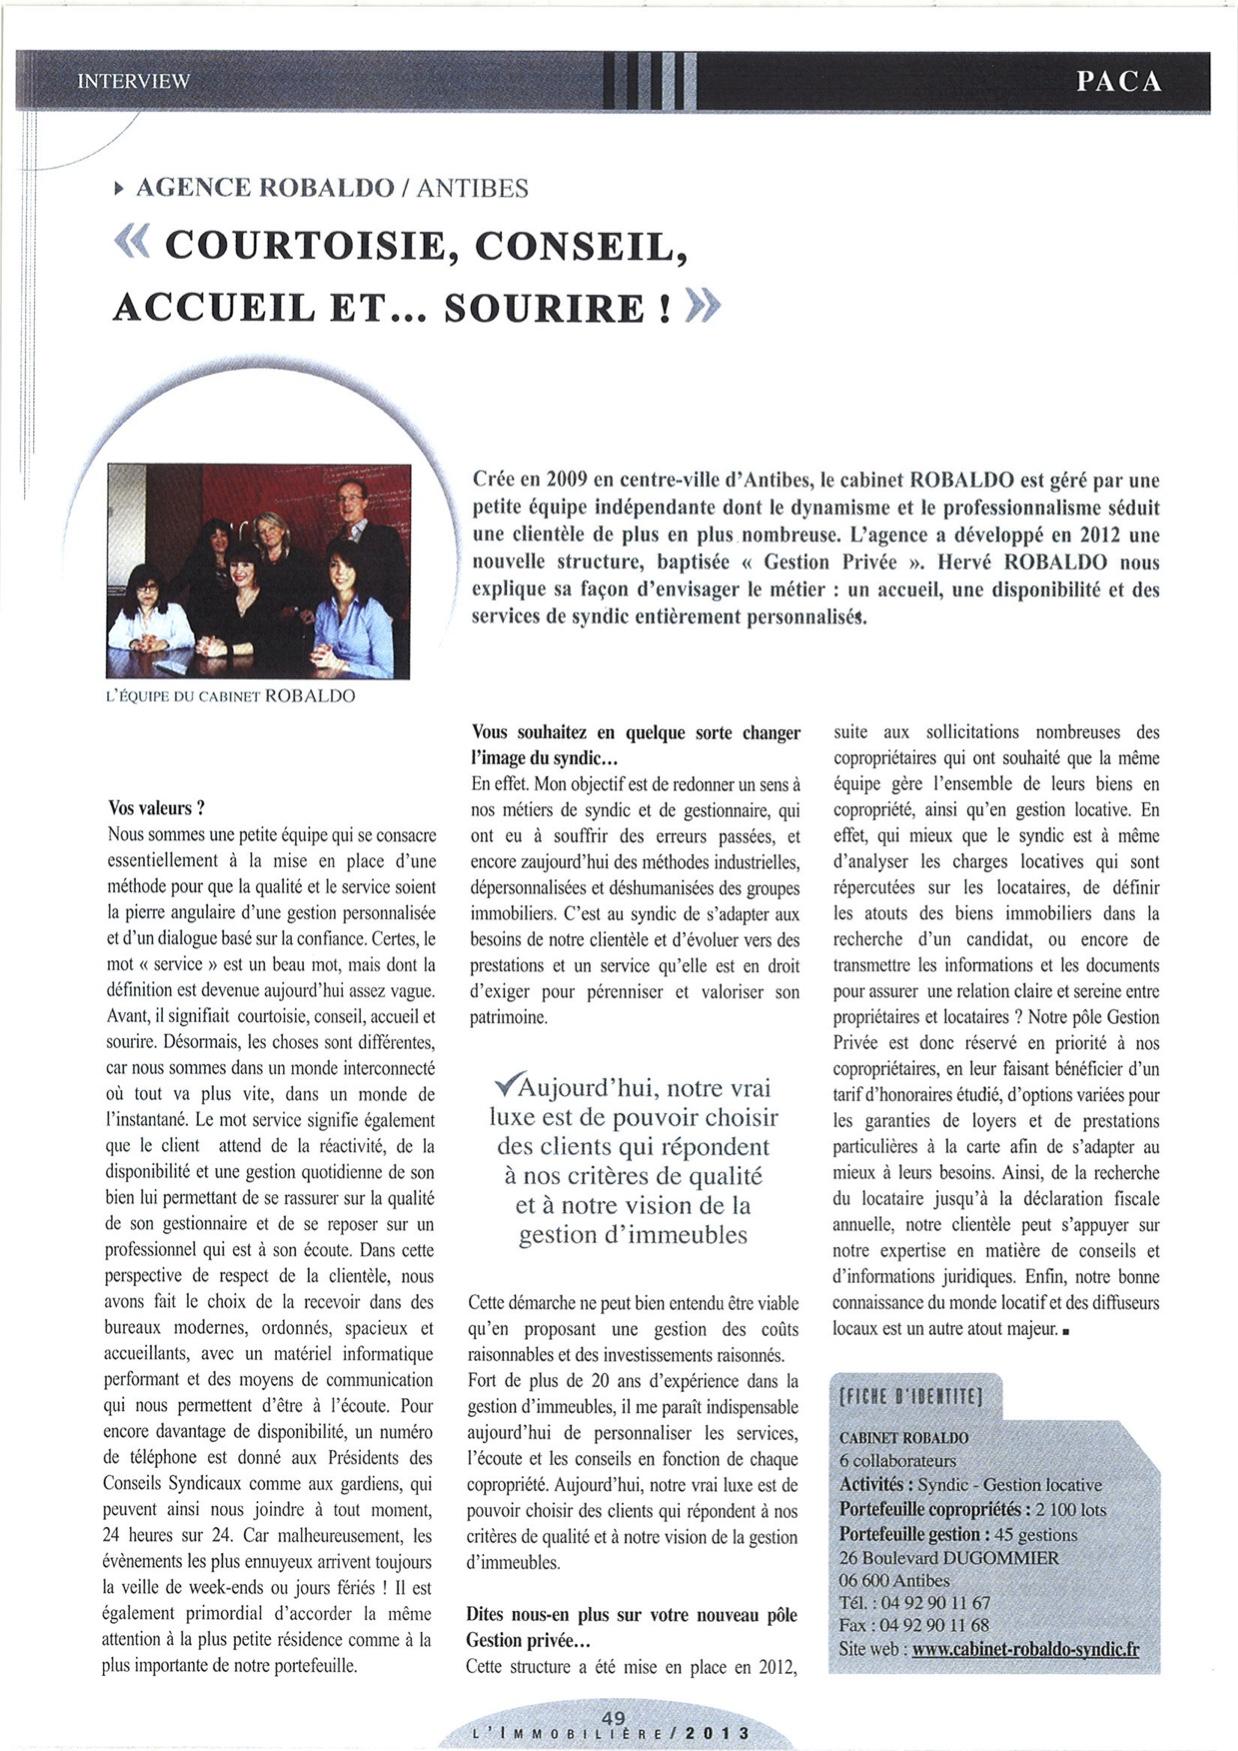 AGIRA revue de presse 2013